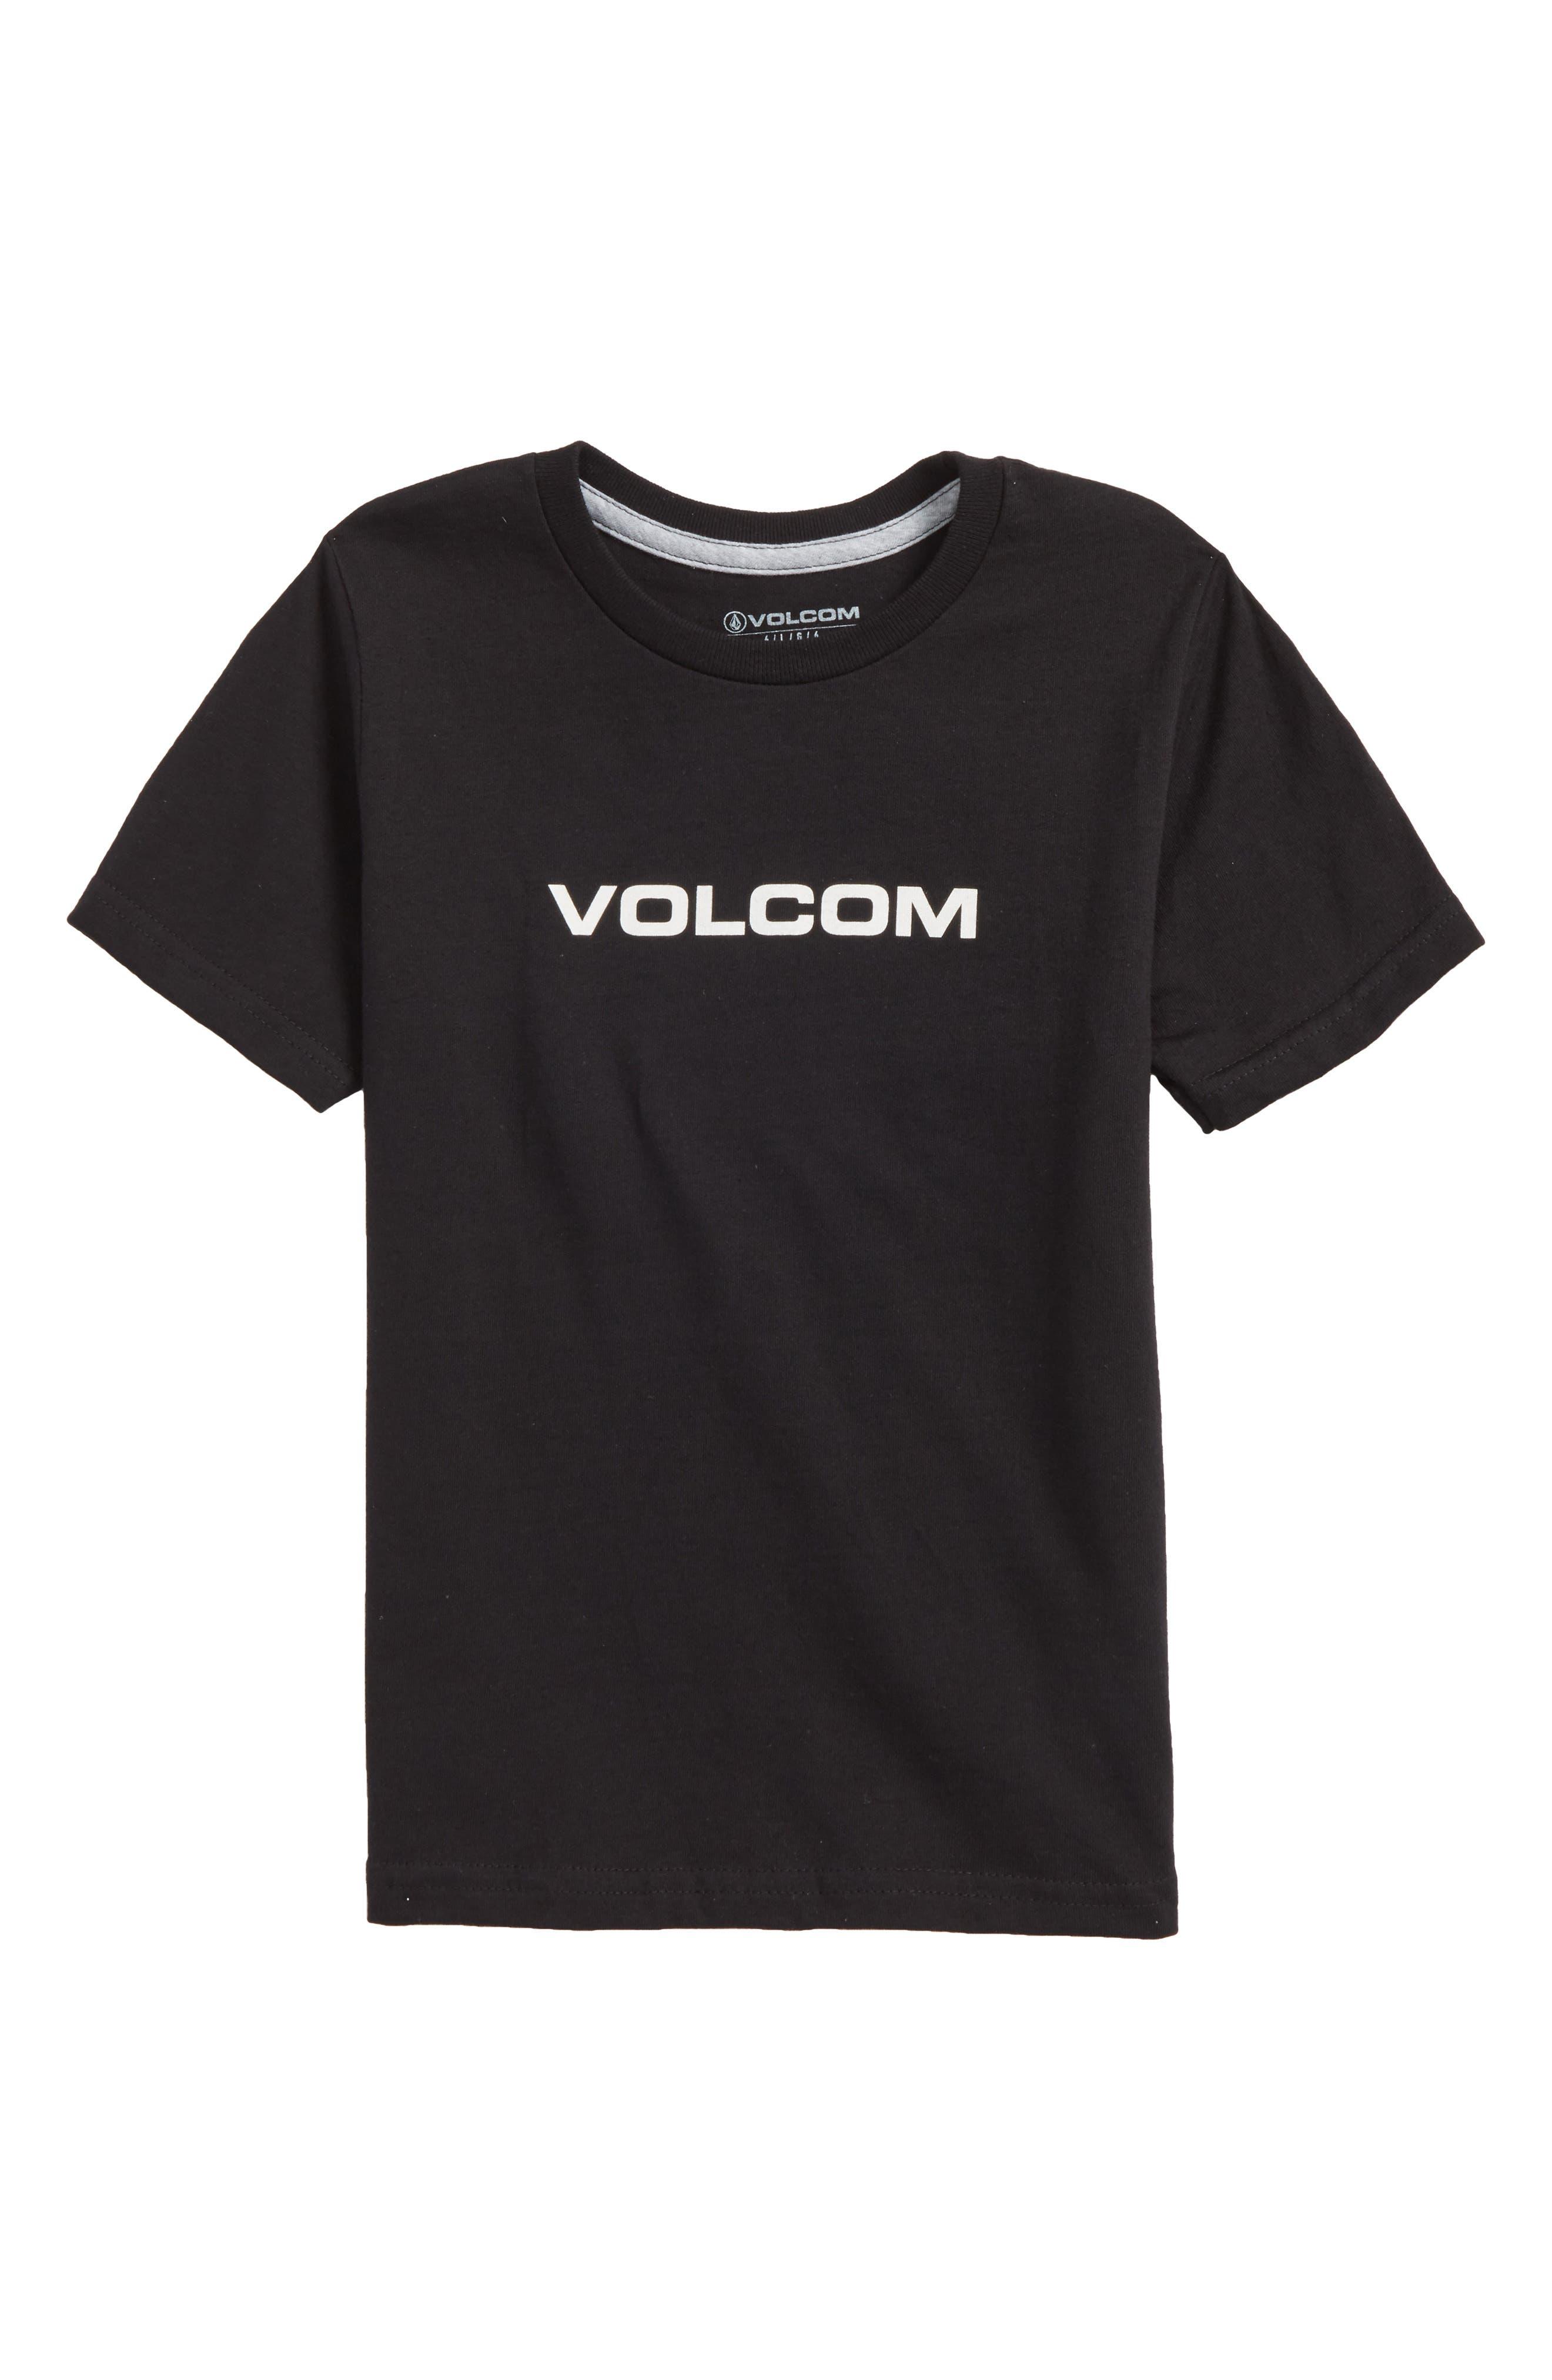 Main Image - Volcom Crisp Euro Graphic T-Shirt (Toddler Boys & Little Boys)